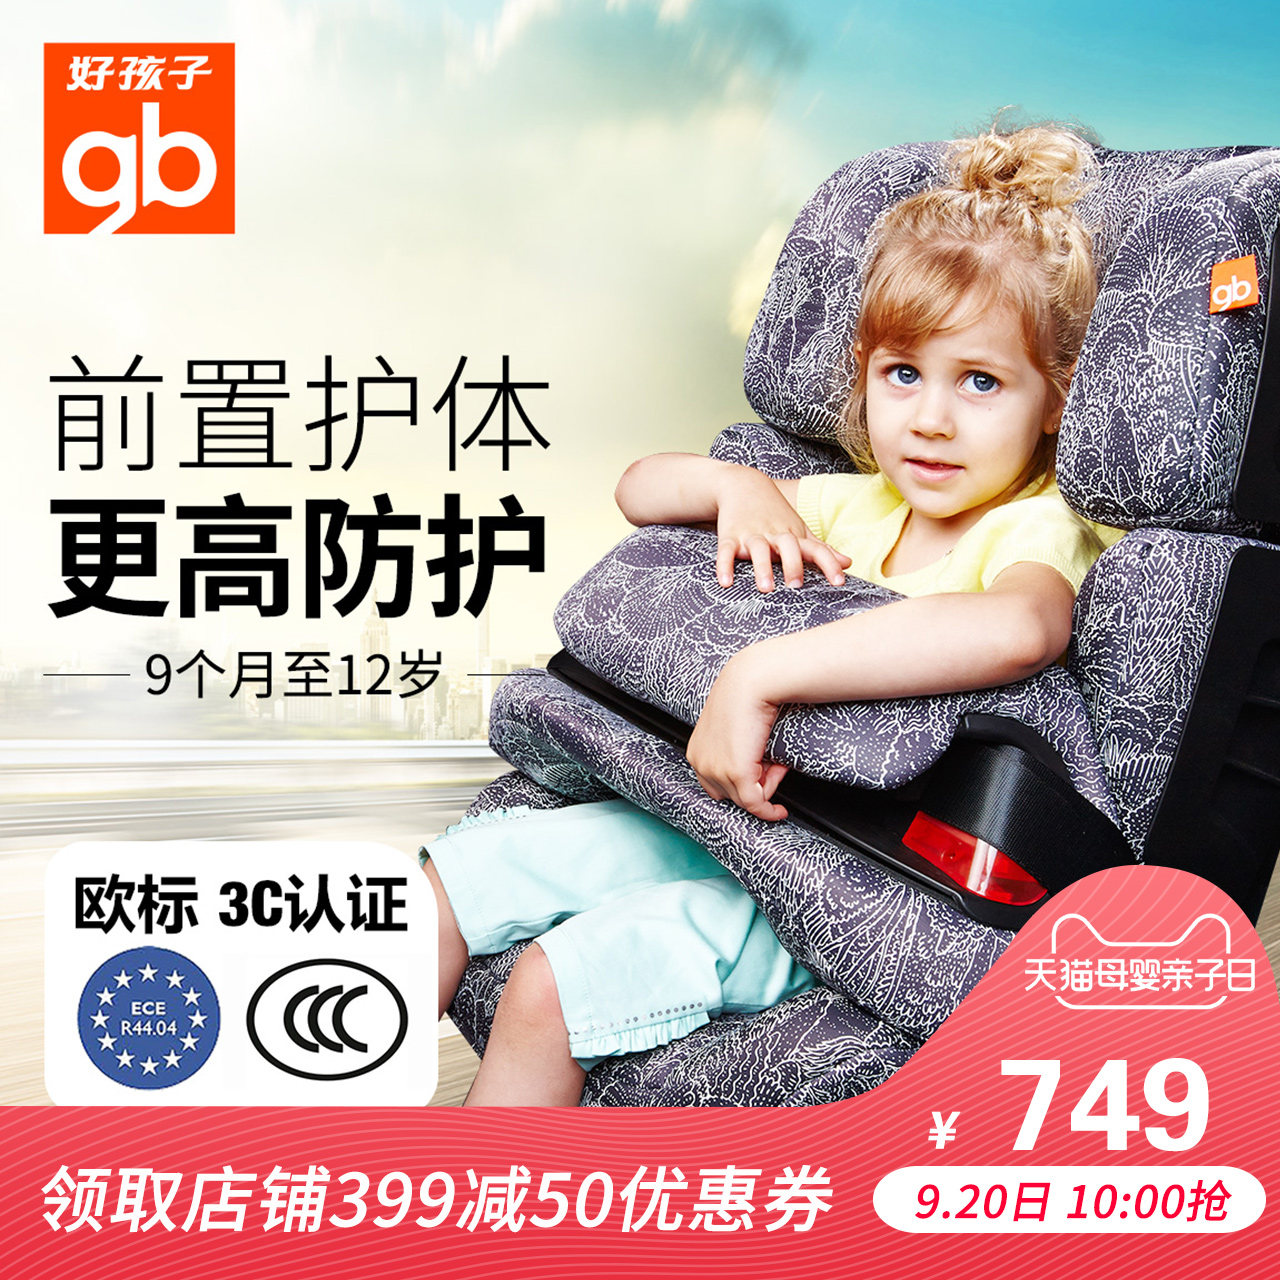 gb好孩子汽车儿童安全座椅宝宝汽车用座椅9个月-12岁CS612